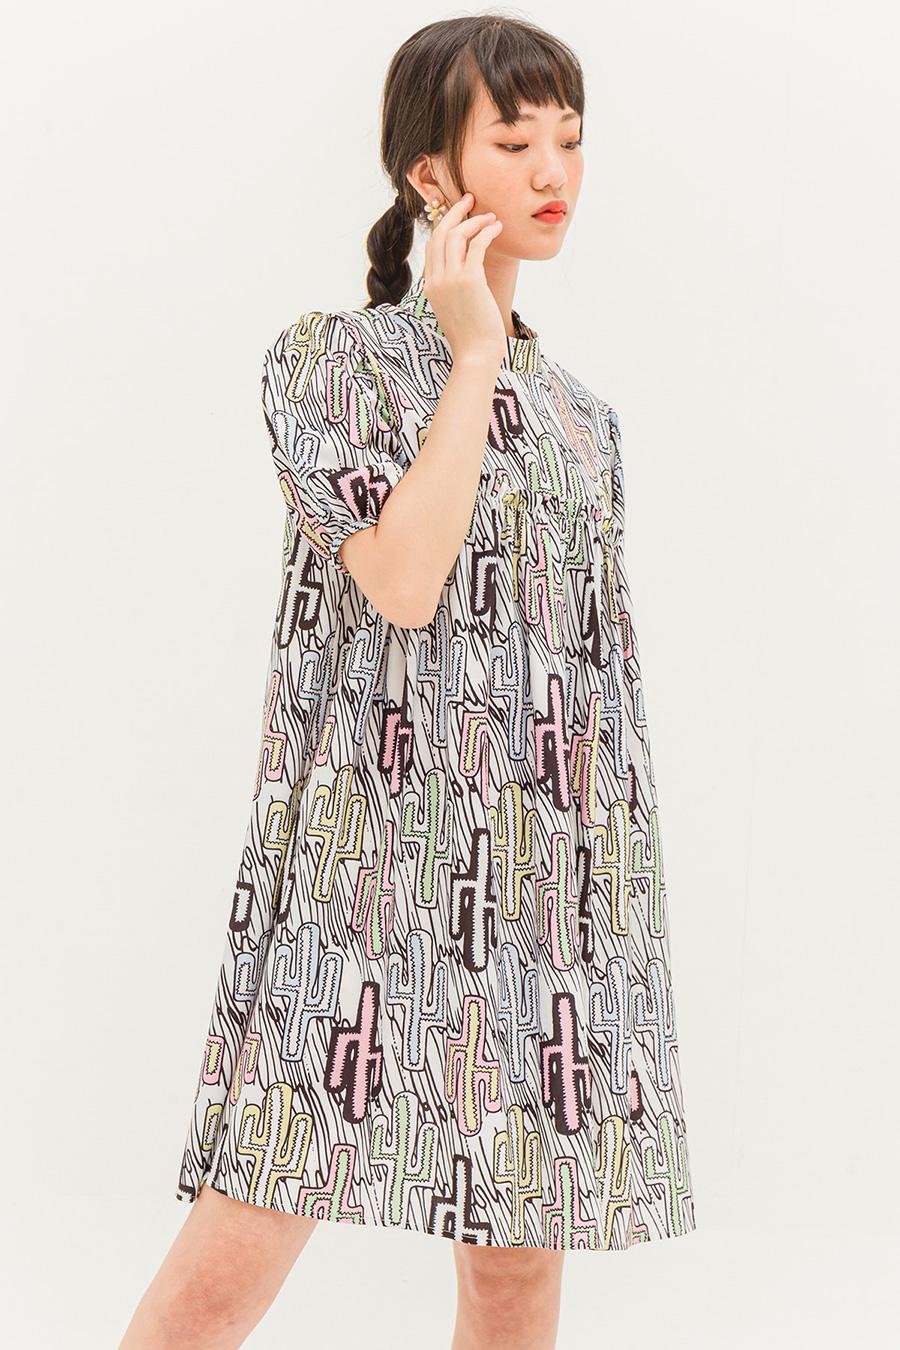 MAURINE DRESS - CACTUS